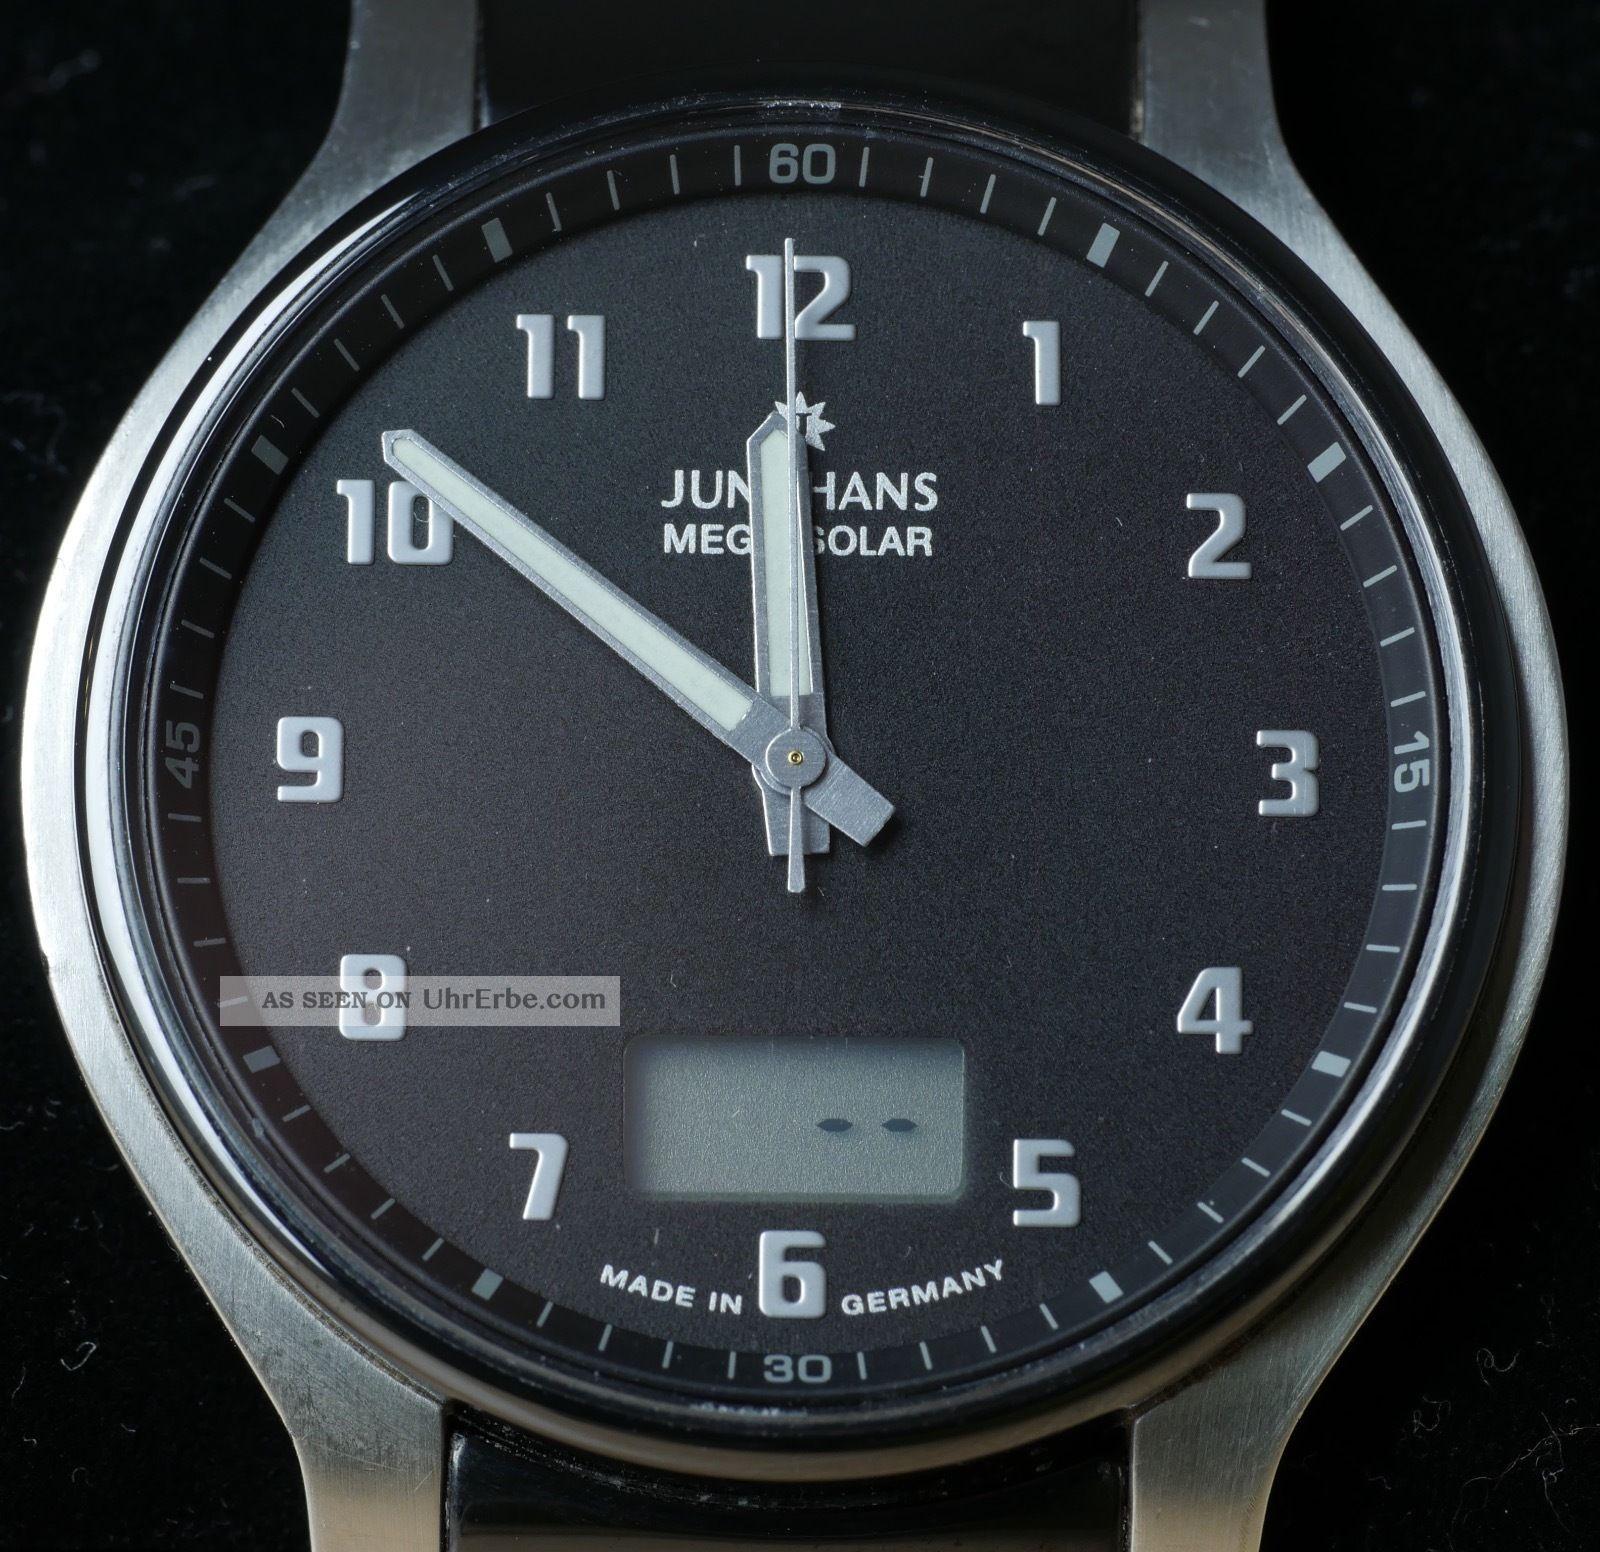 Junghans Mega Solar Ceramic Armbanduhren Bild